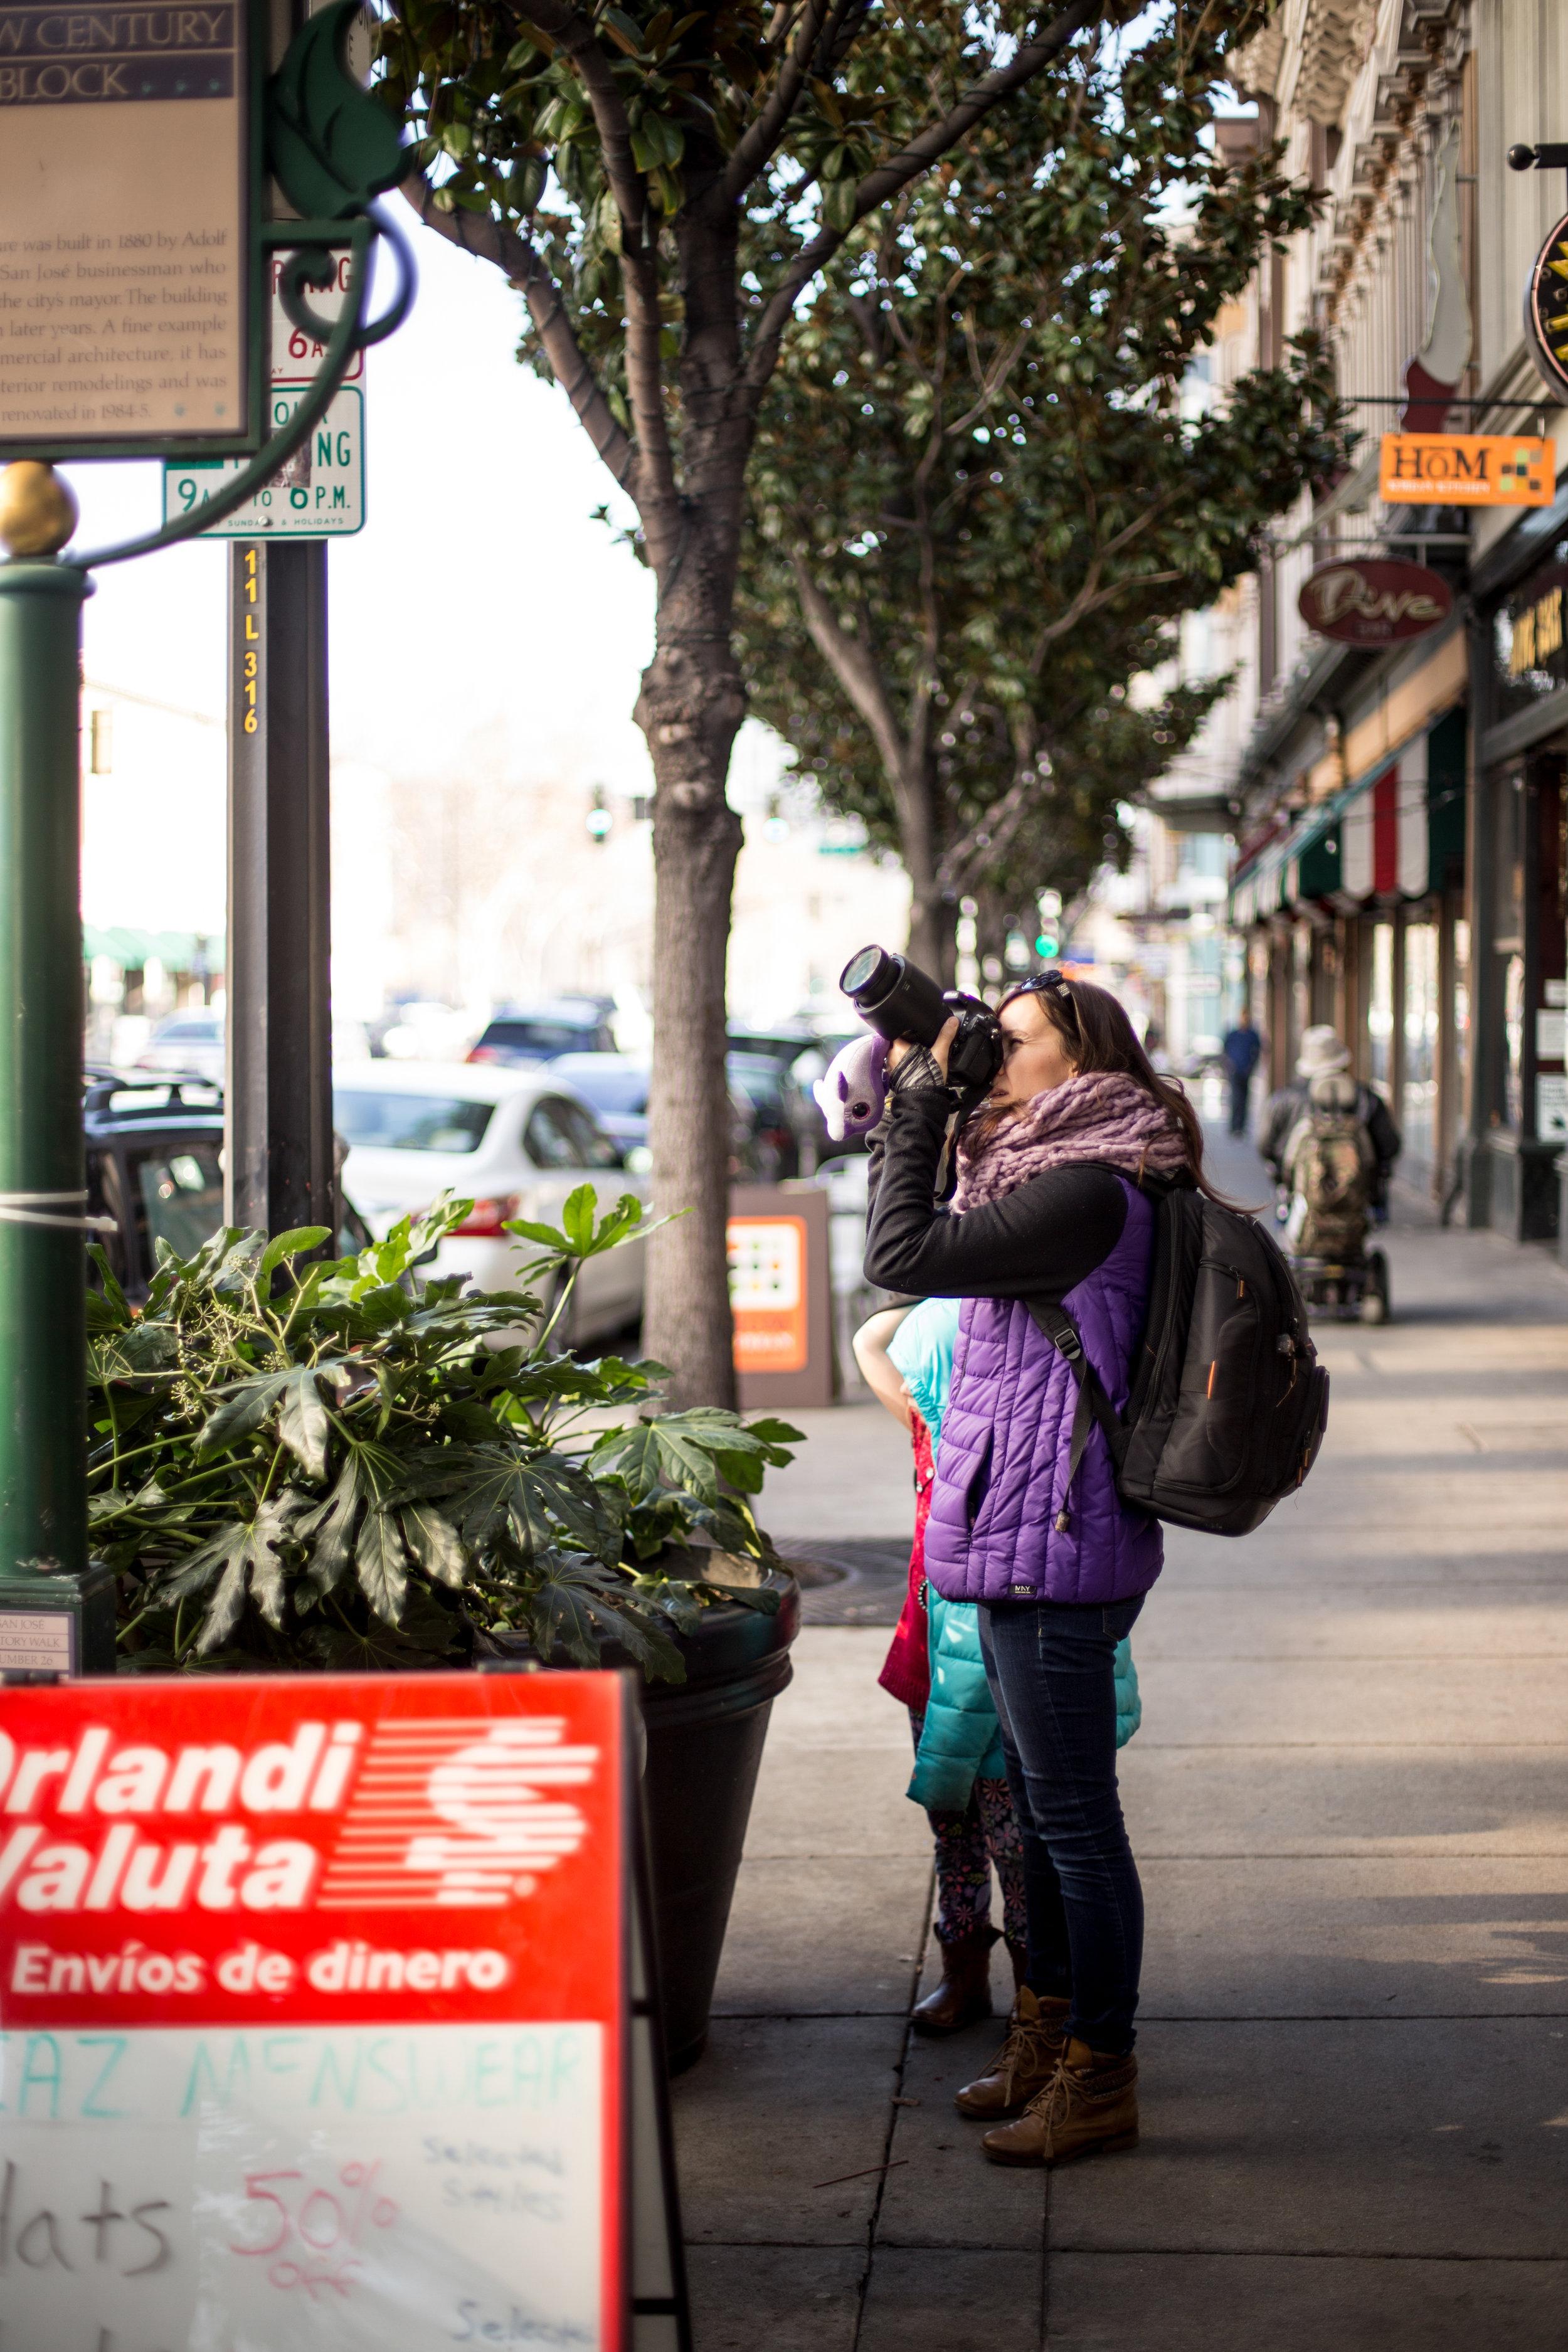 Ewa Samples Photography taking a photo in downtown San Jose